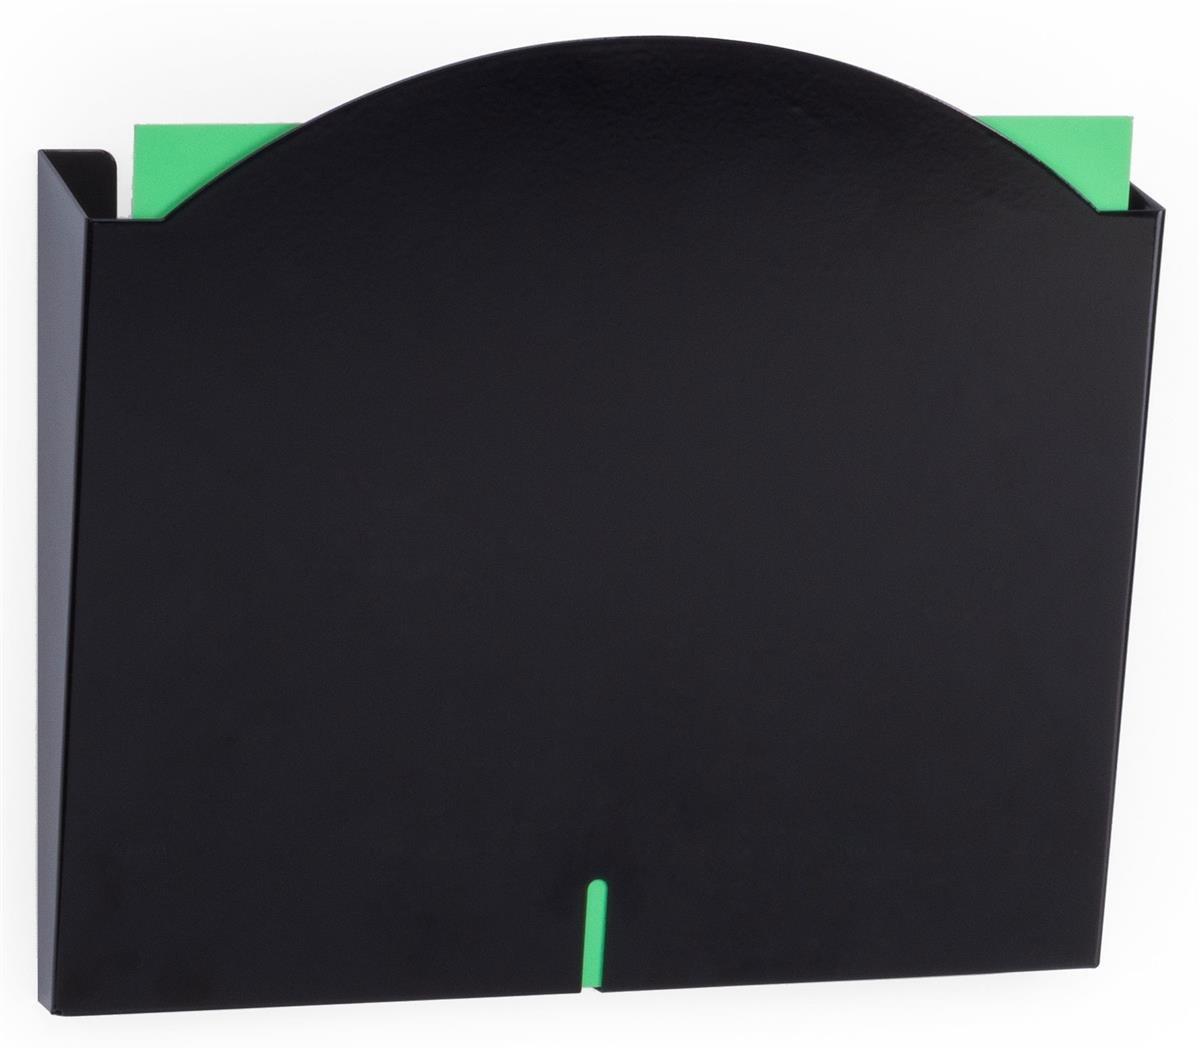 Displays2go Wall File Folder Racks, Medical and Office Pockets (2HPP01BLK)